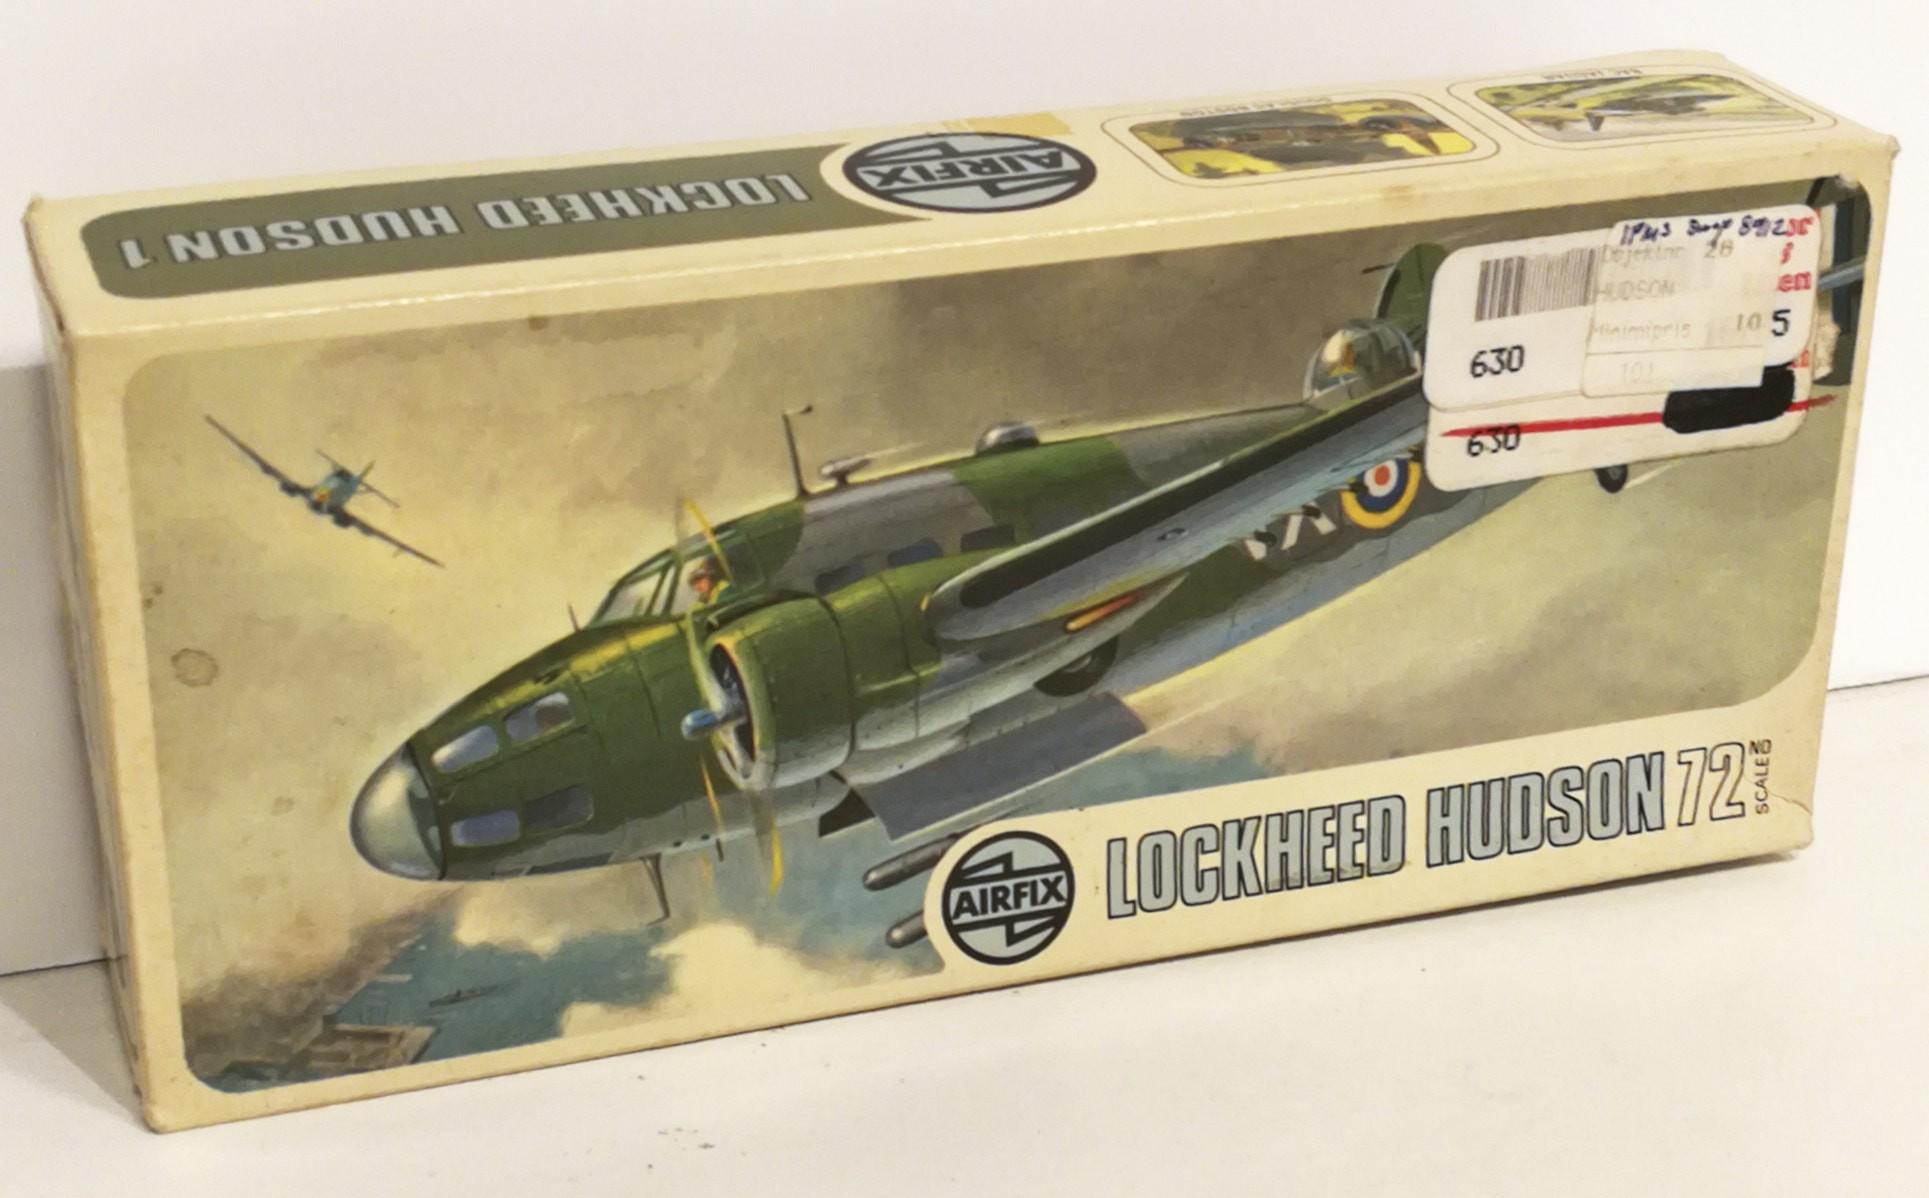 Lockheed Hudson I